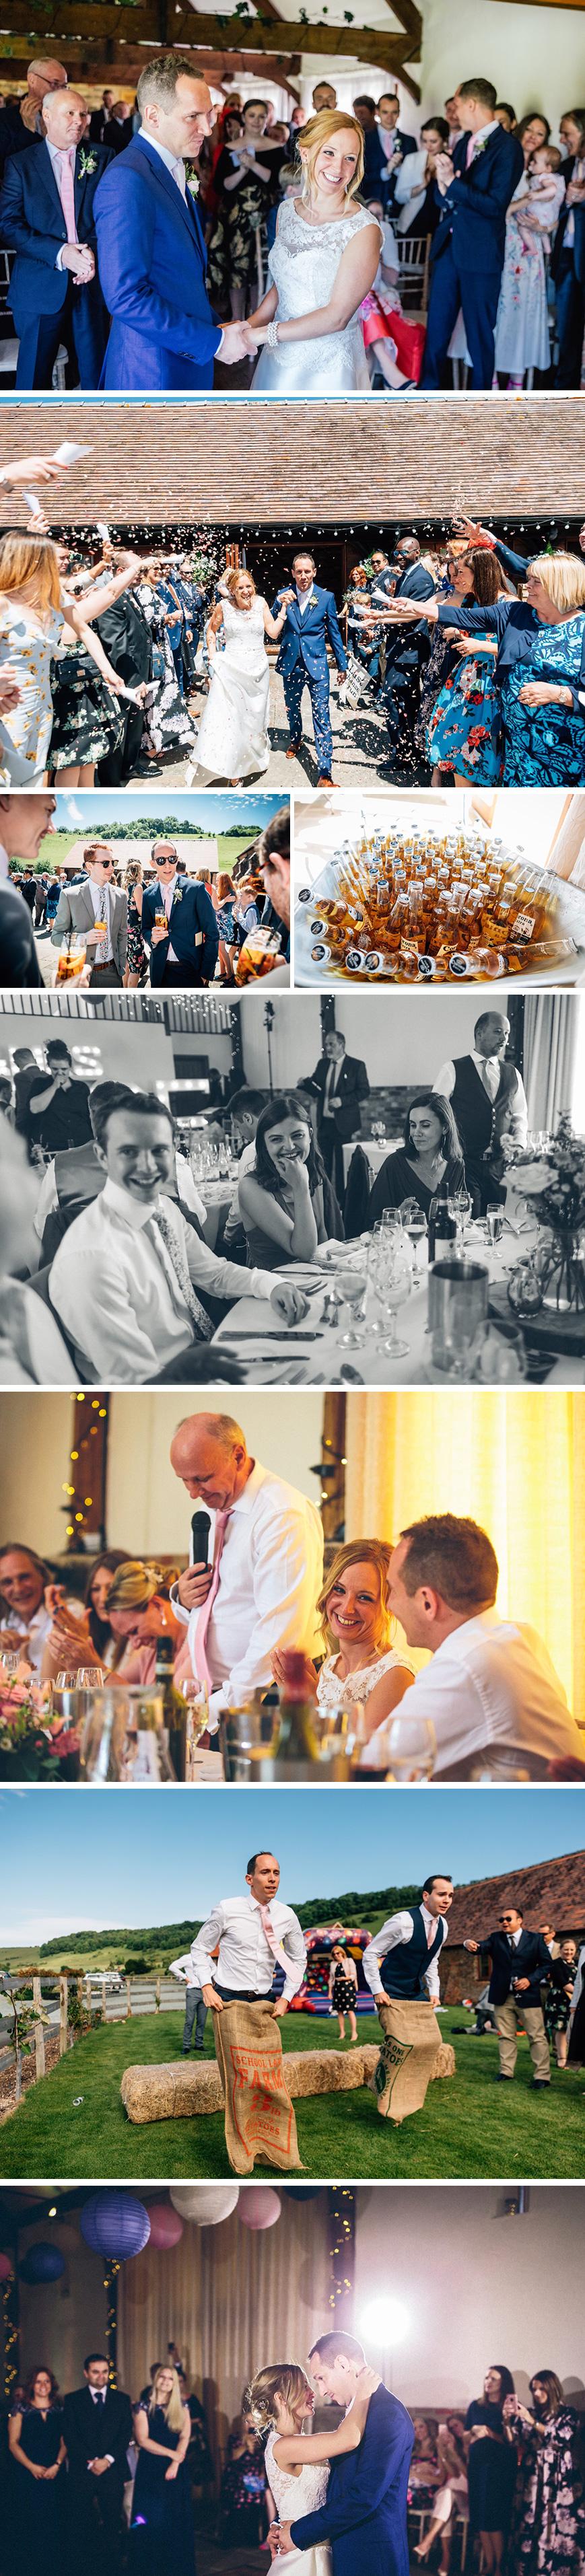 Real Wedding - Hannah and Kieran's Idyllic Summer Wedding at Long Furlong Barn | CHWV